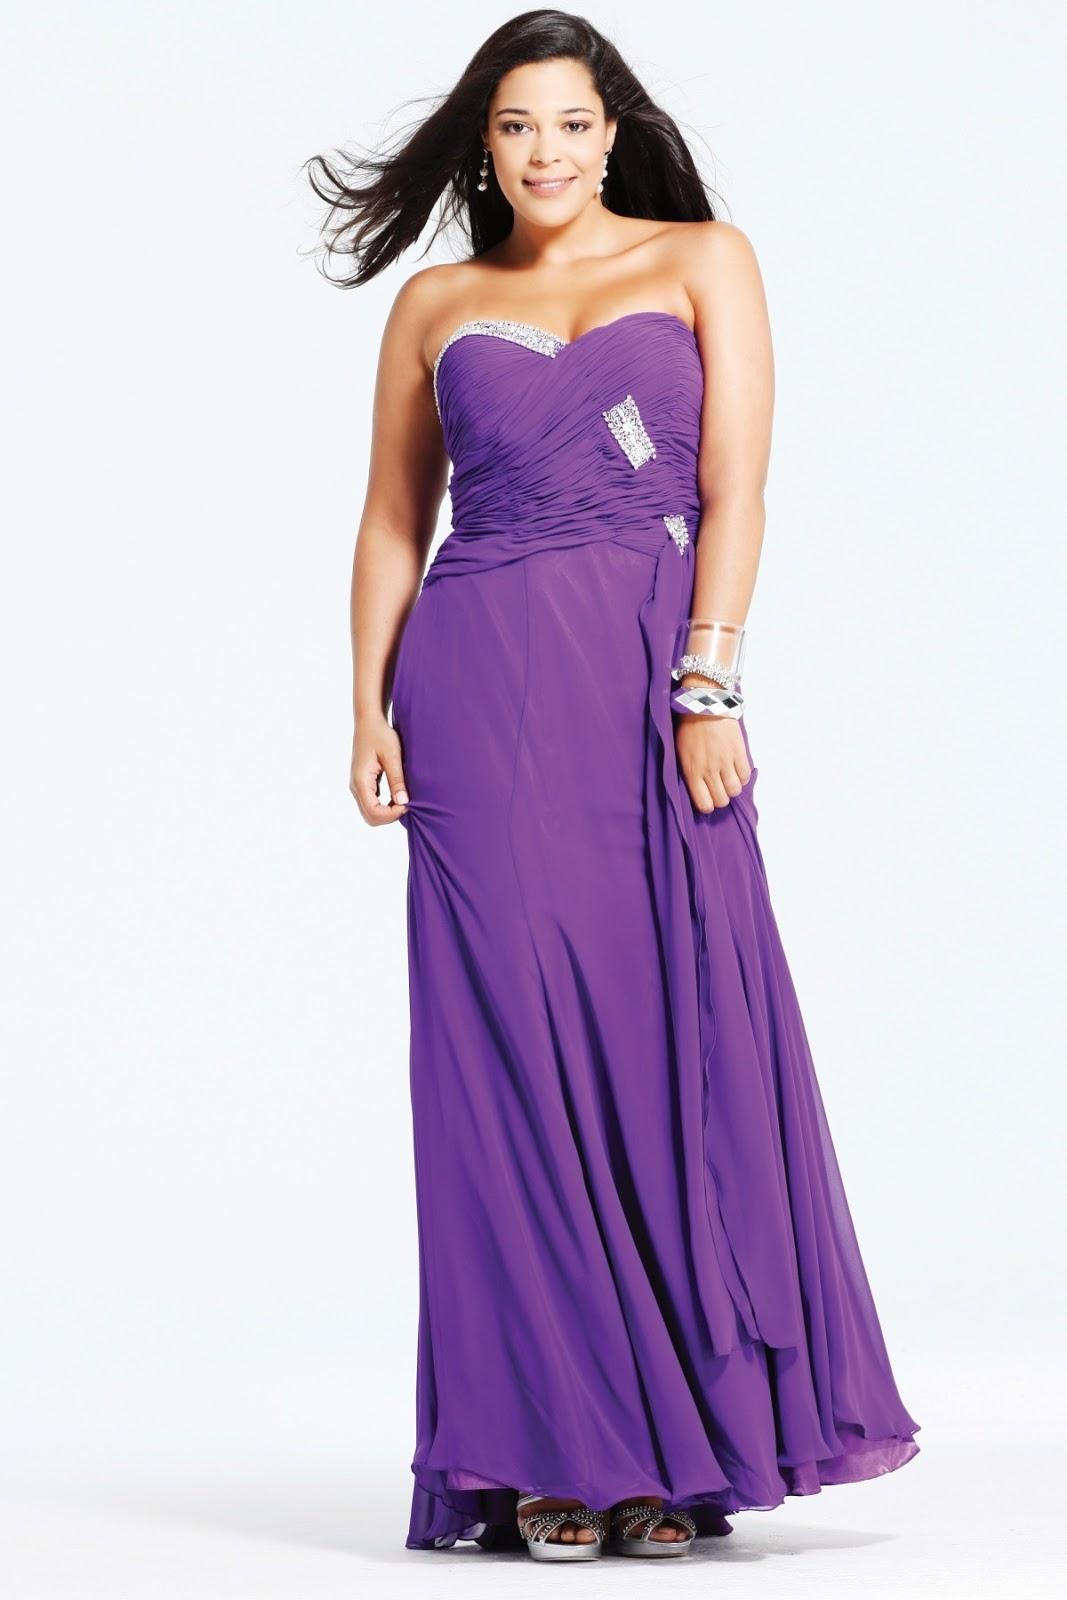 wedding dress purple color purple wedding dresses Wedding Dress Purple Color 20